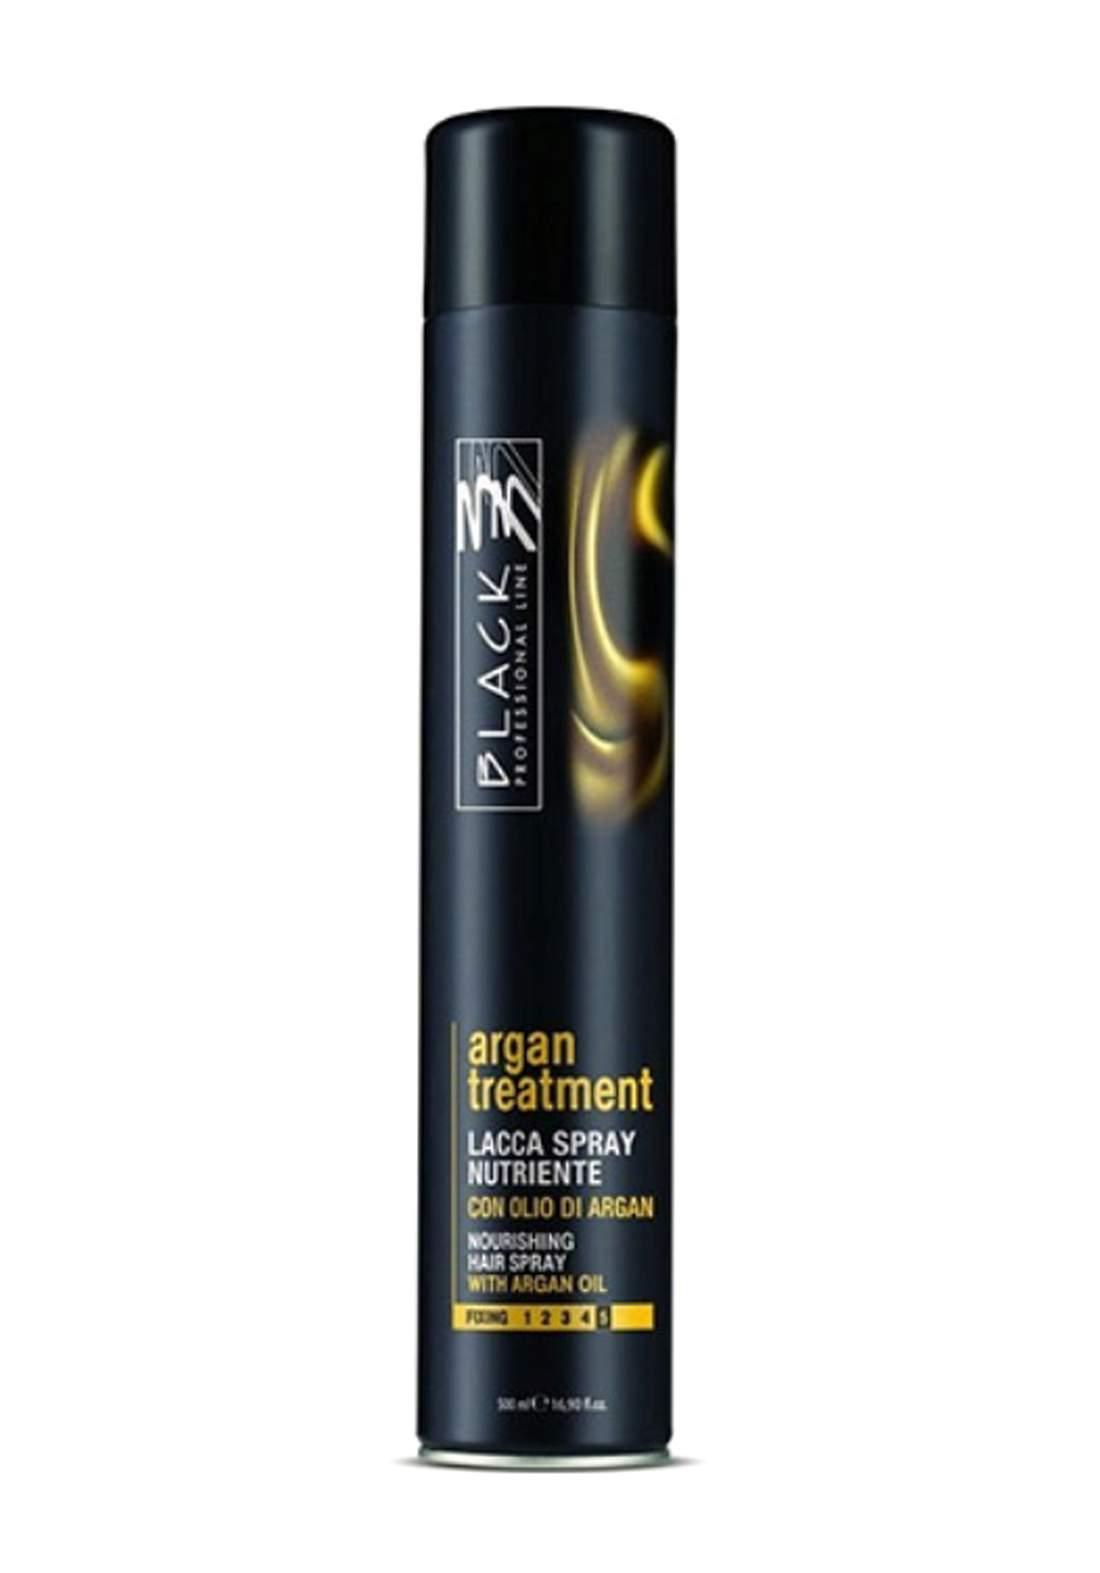 Black Professional Argan Treatment Spray 500ml سبري للشعر